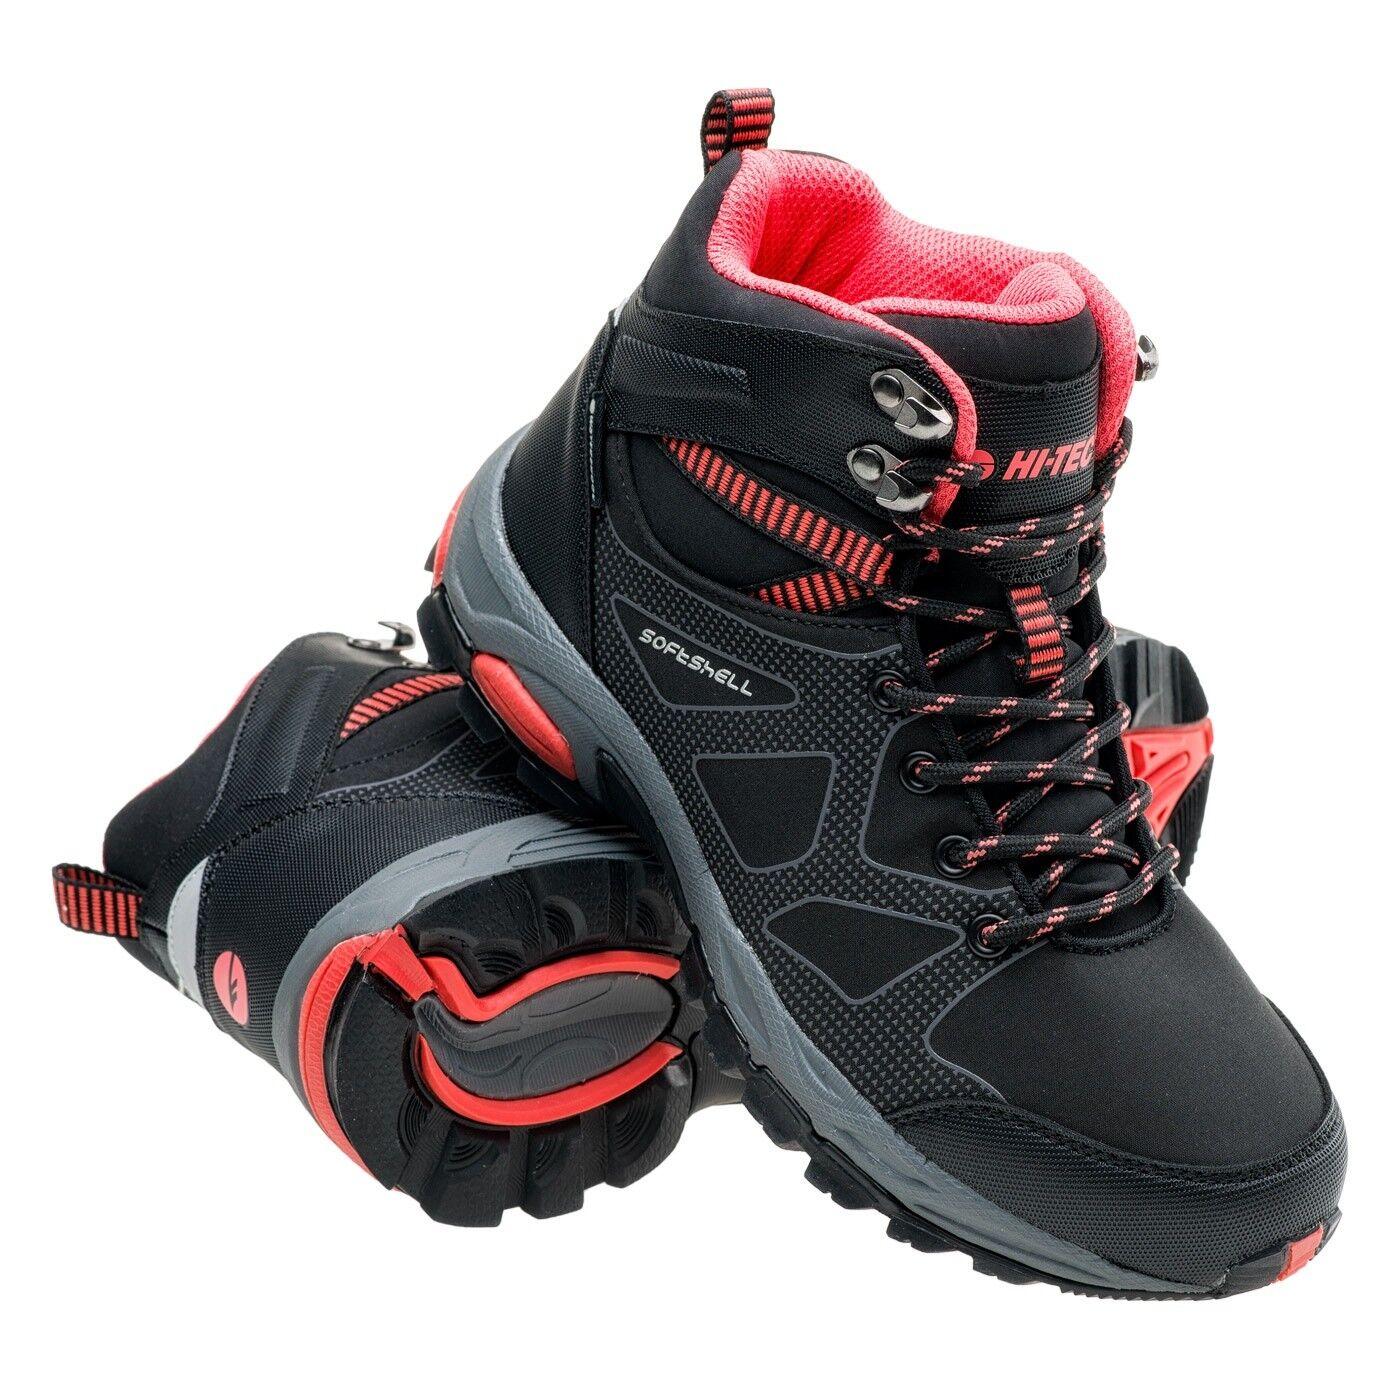 HI-Tec Fumiko Scarponcini donna scarpe da trekking Scarpe Stivali Stivaletti WATERPROOF